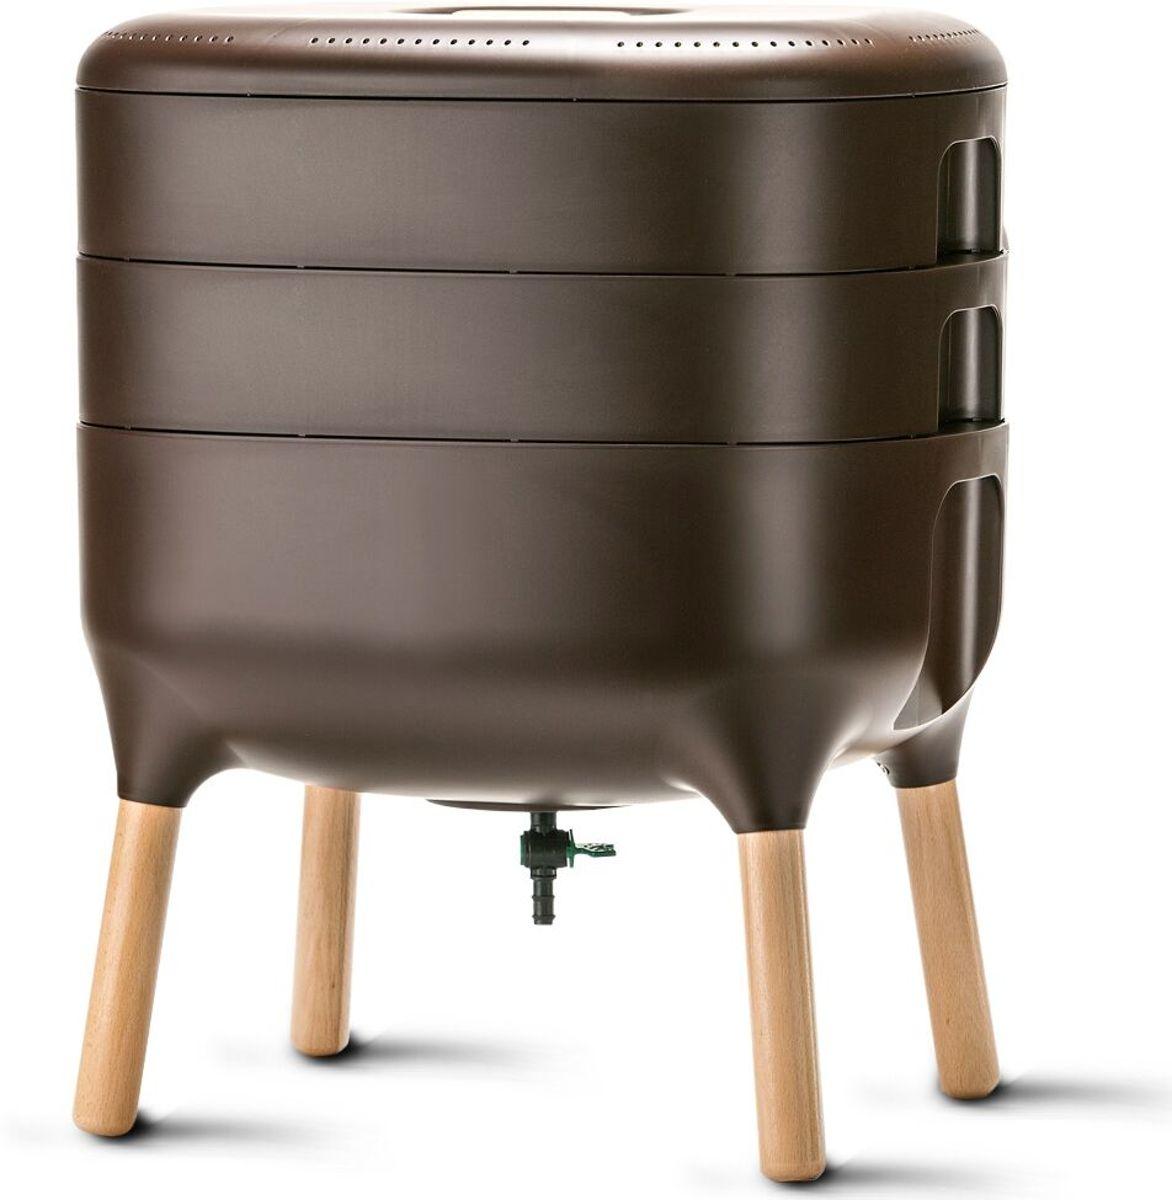 Wormenbak - Worm Composter